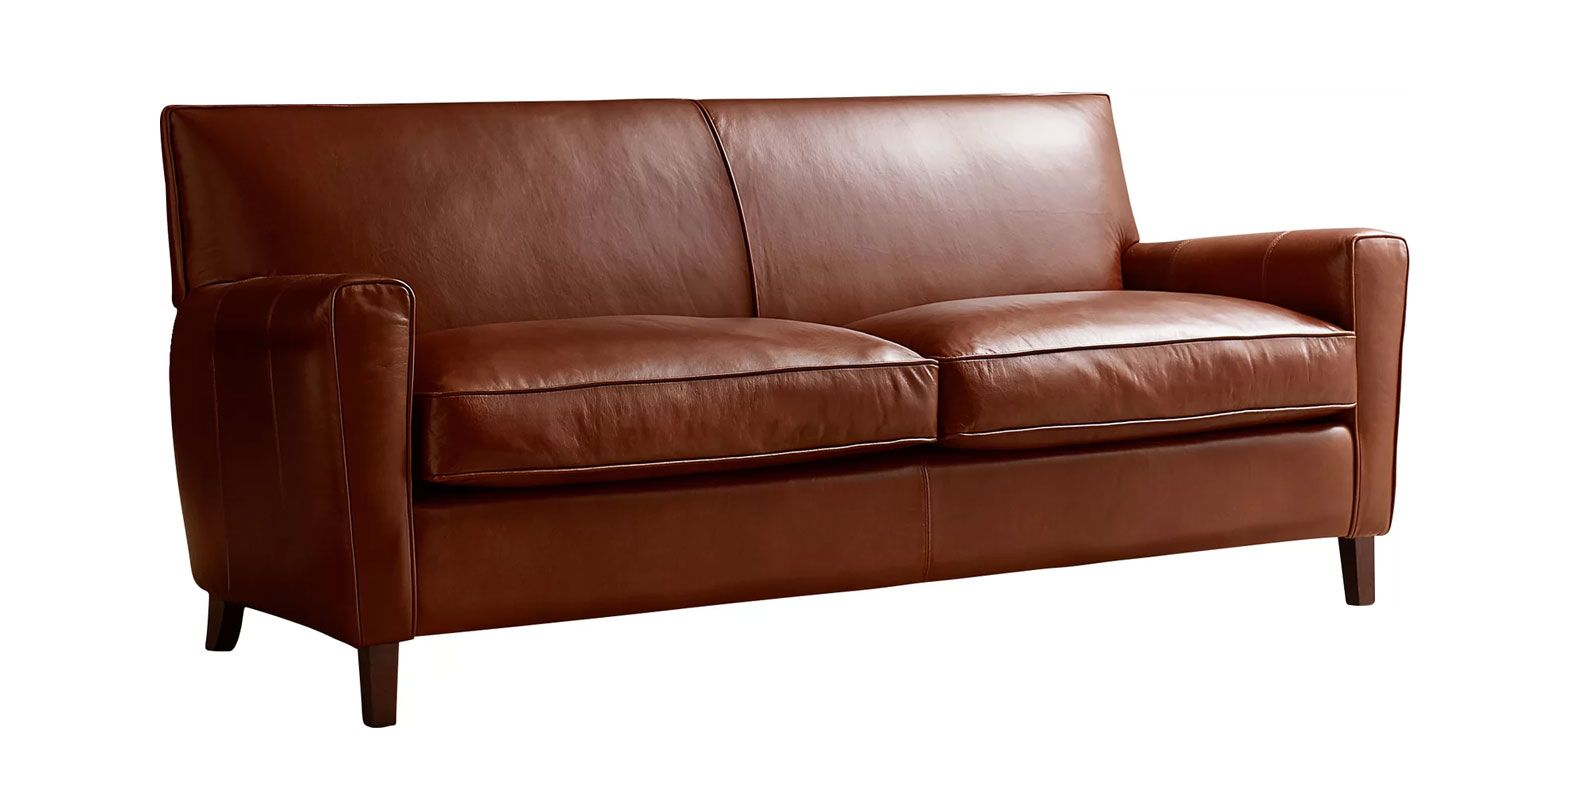 Sofa Occasional Quality Living Room Furniture Modern Sofa